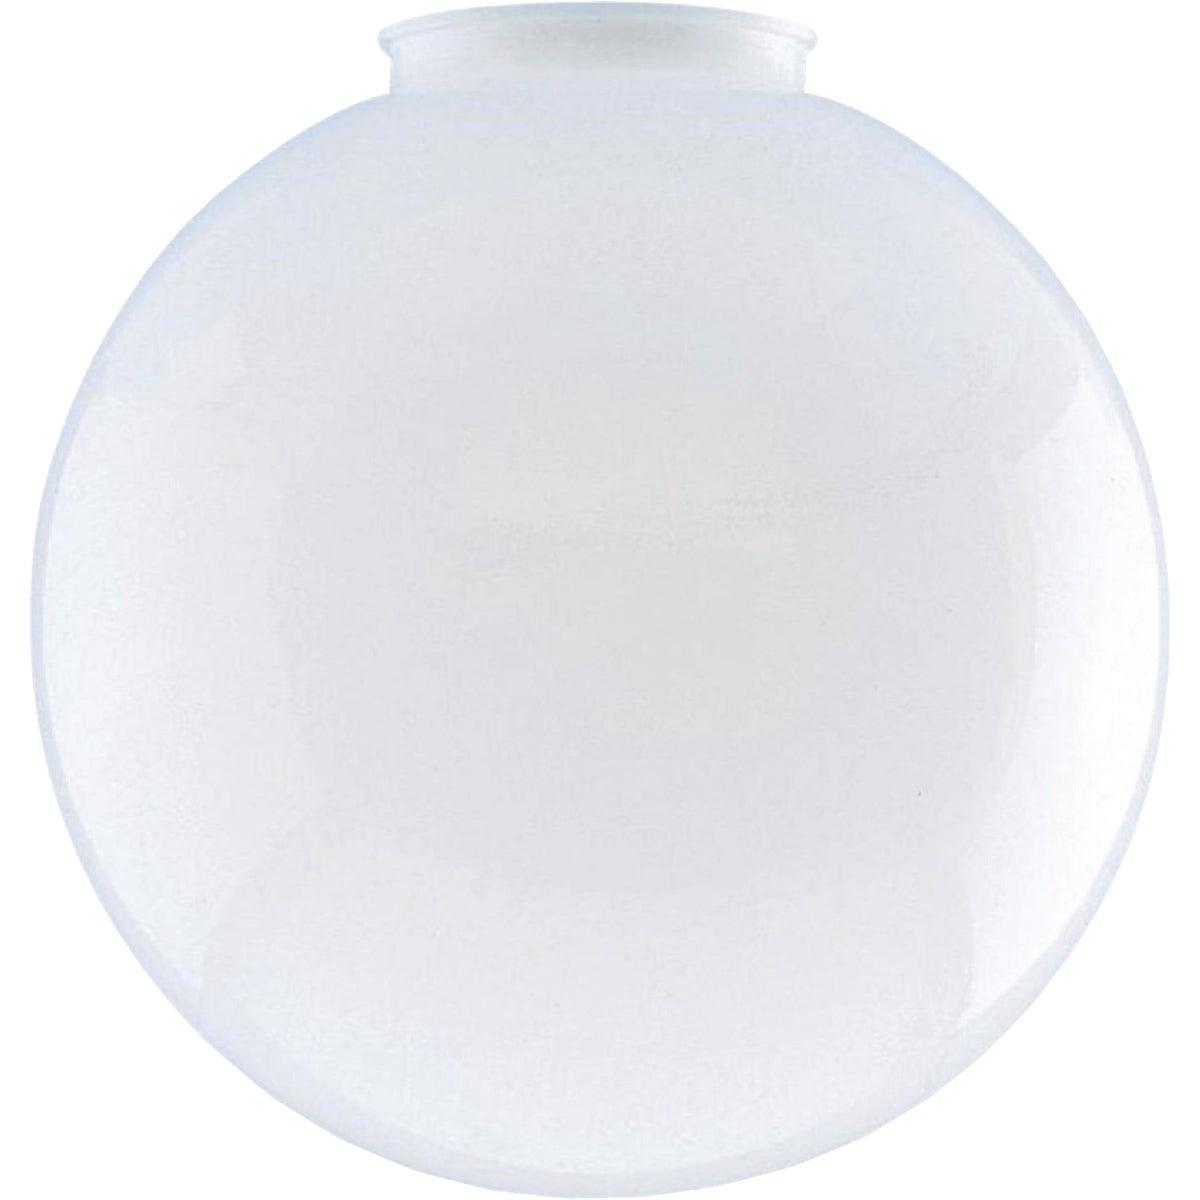 WHT ACRYLIC FIXTUR GLOBE - 81900 by Westinghouse Lightng